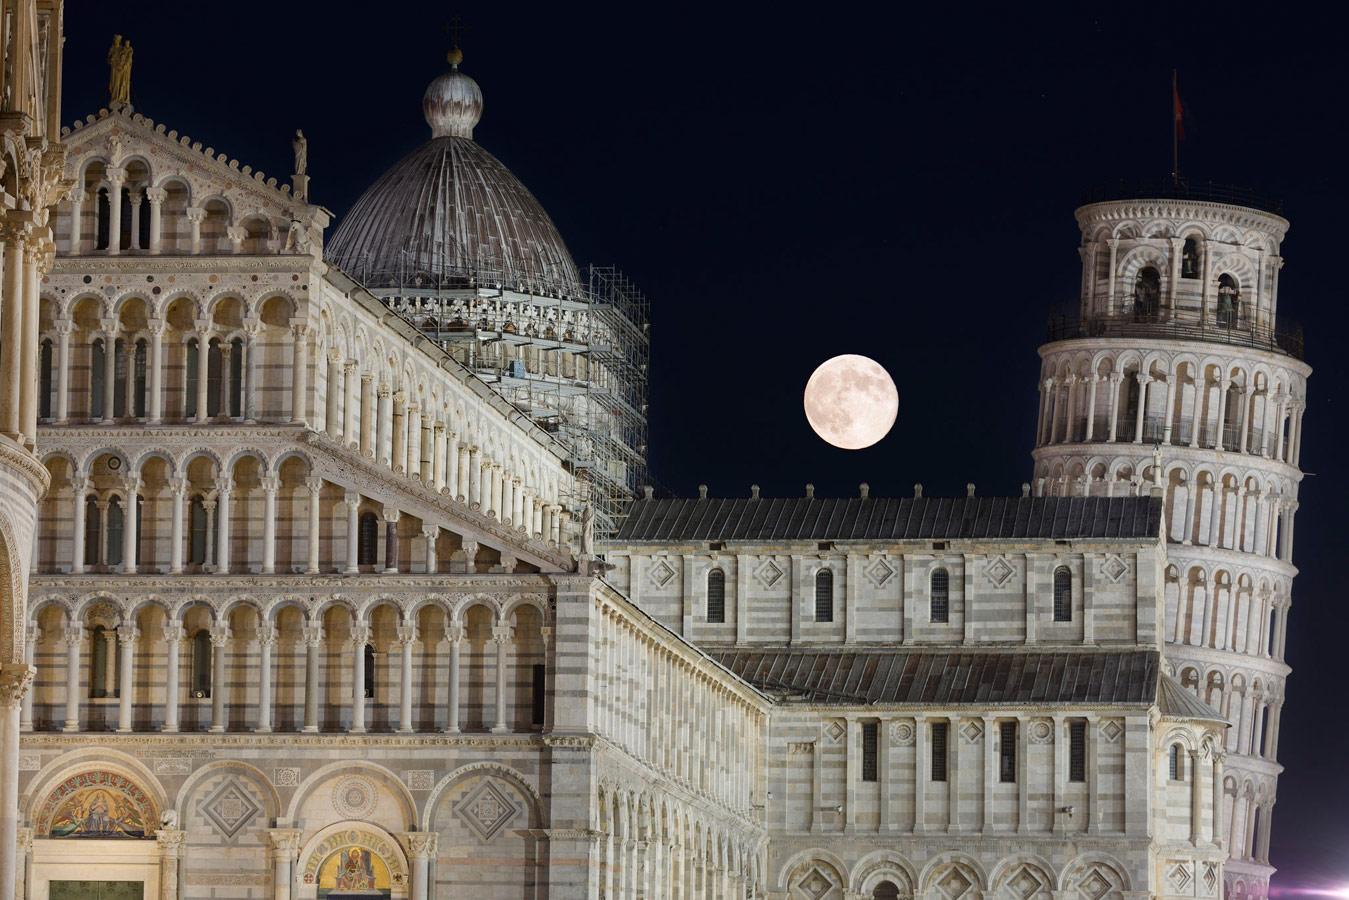 Фотоконкурс «Ночной пейзаж» — Photo Nightscape Awards